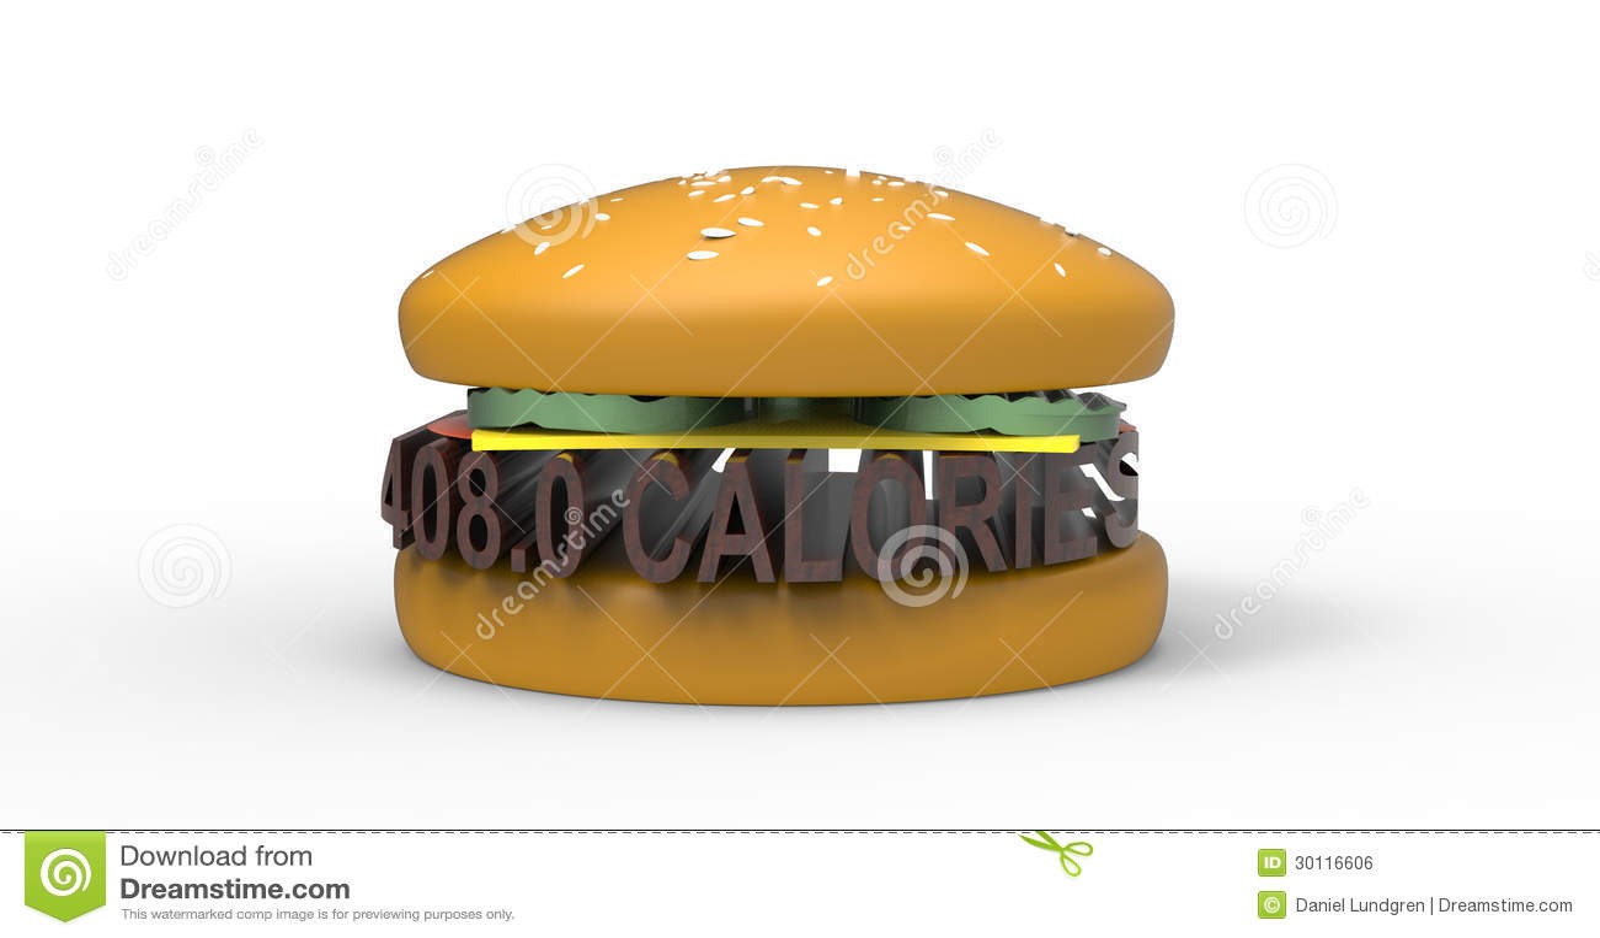 calories in hamburger stock illustration illustration of many 30116606. Black Bedroom Furniture Sets. Home Design Ideas